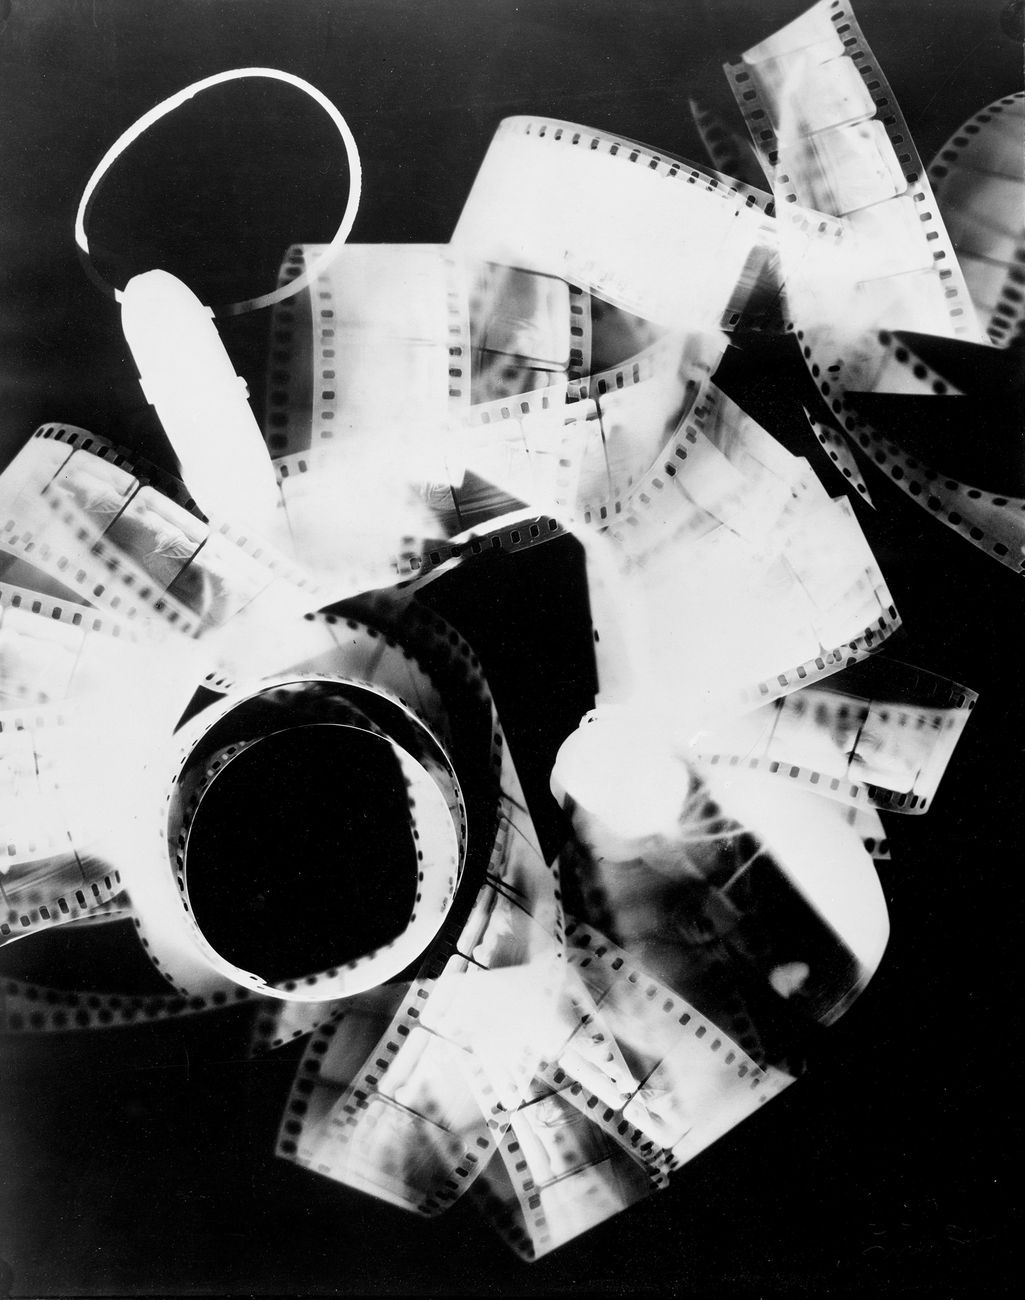 Man Ray, Ohne Titel (Rayografie), 1923, Silbergelatineabzug Museum Ludwig, Köln © Rheinisches Bildarchiv, Köln © MAN RAY TRUST_Bildrecht, Wien, 2017-18